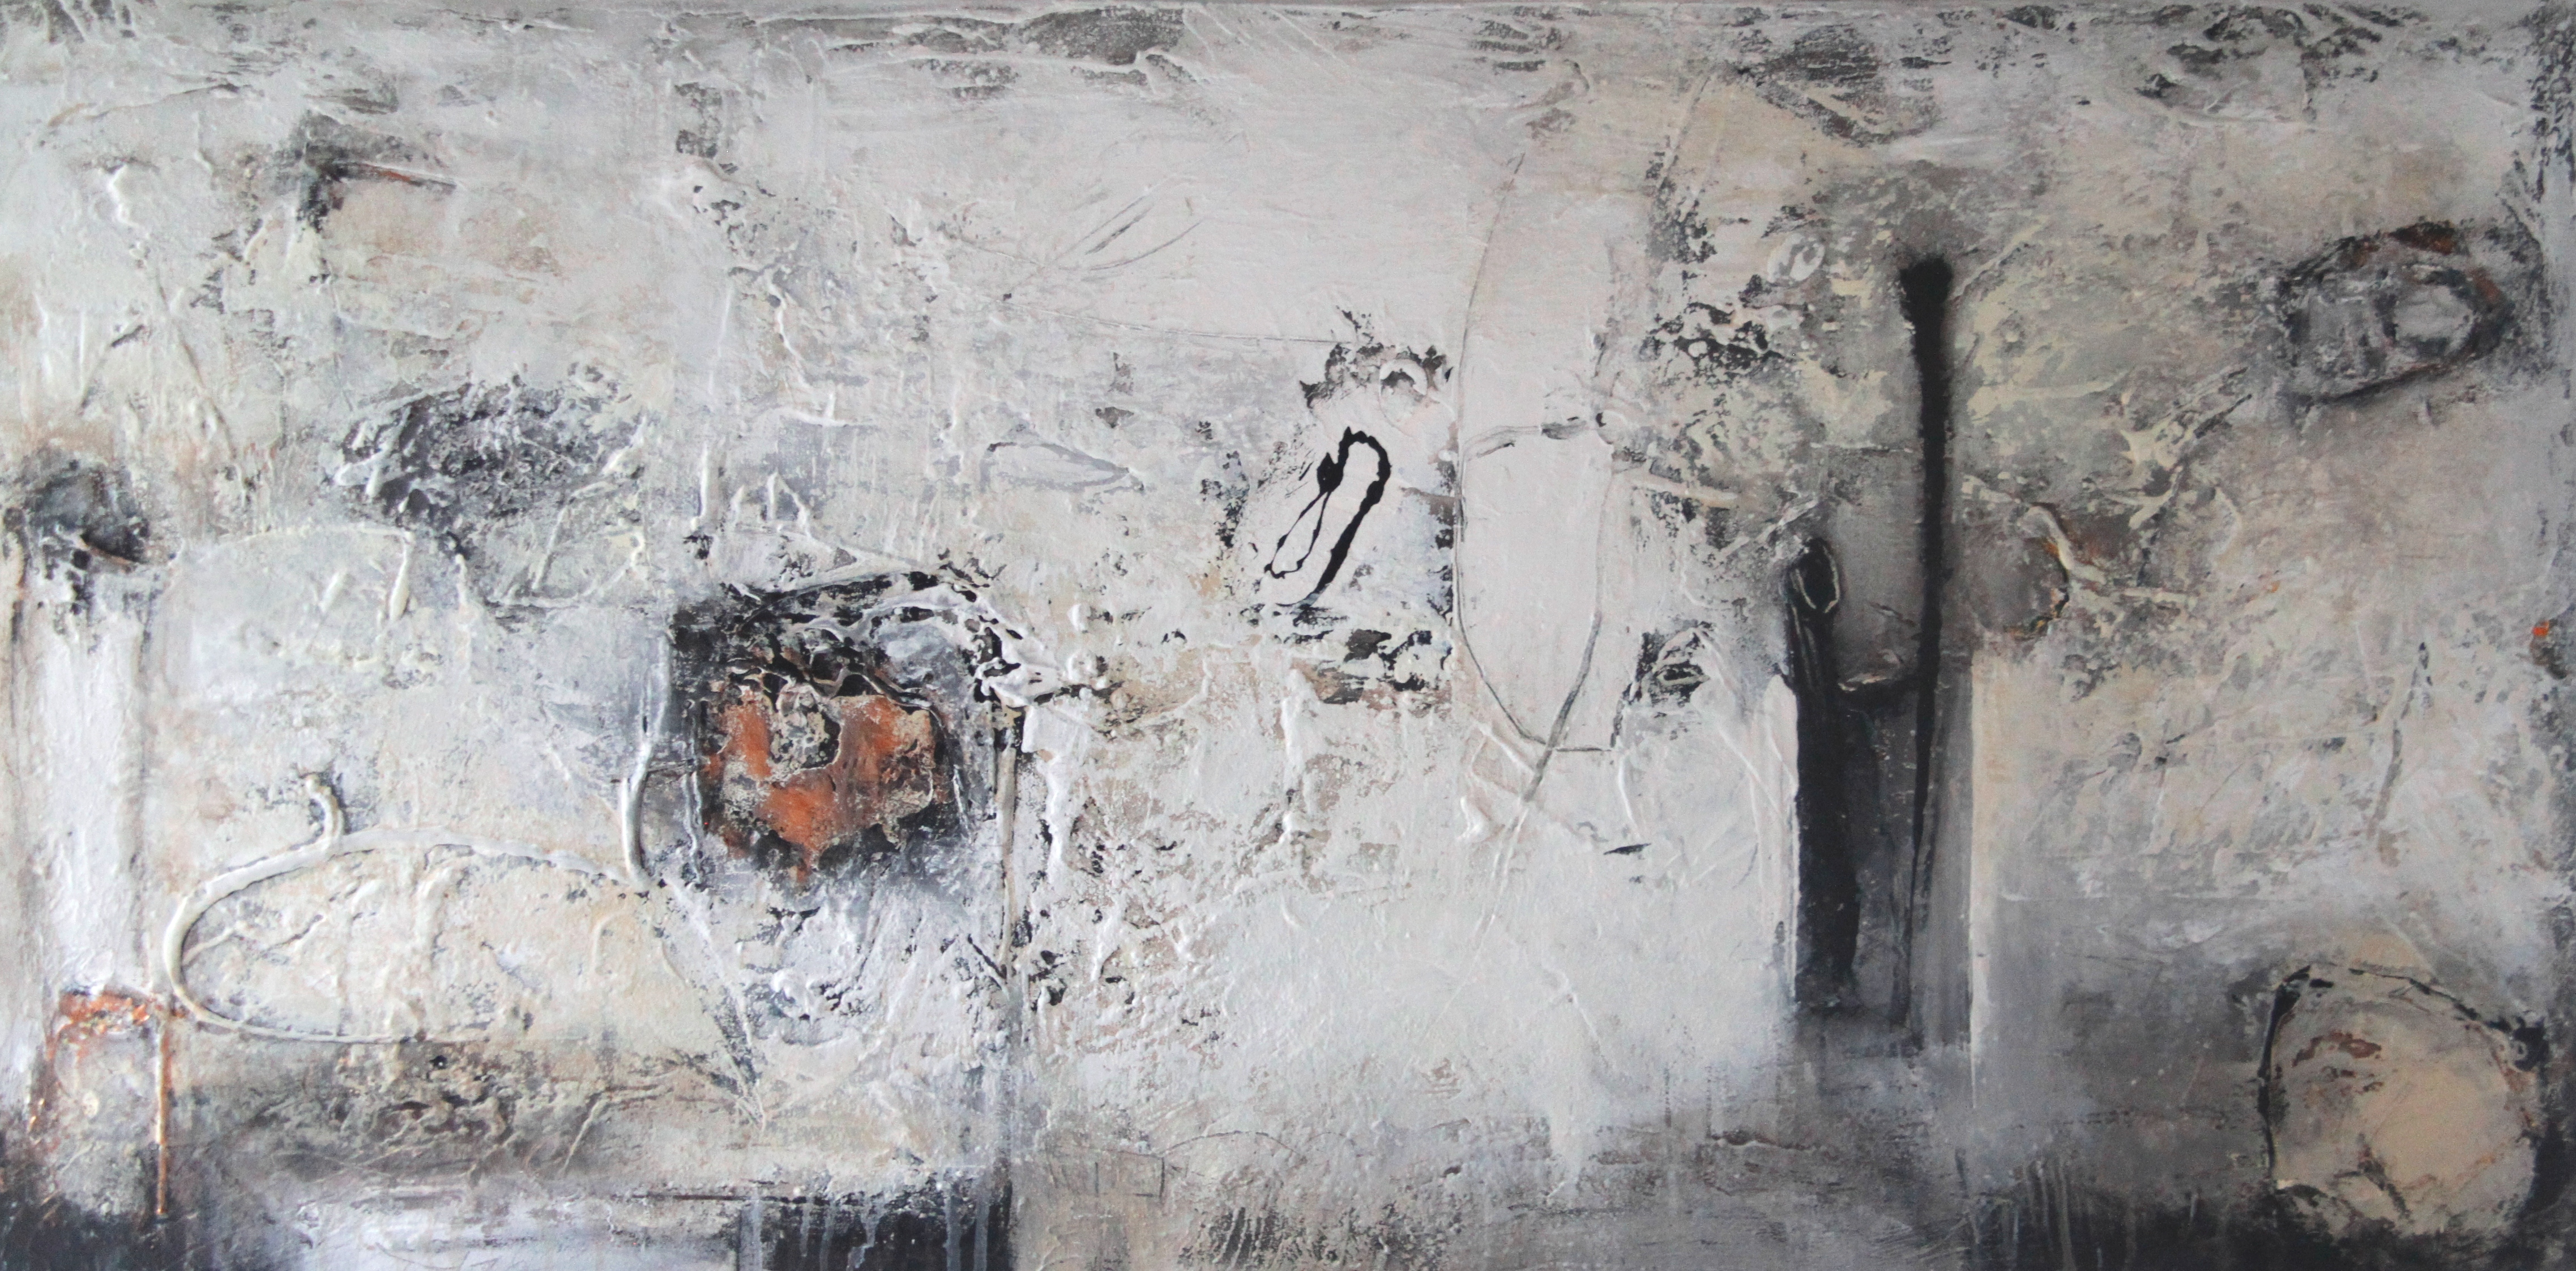 petra-lorch-komposition-10-072-mischtechnik-auf-leinwand-160x90-kopie